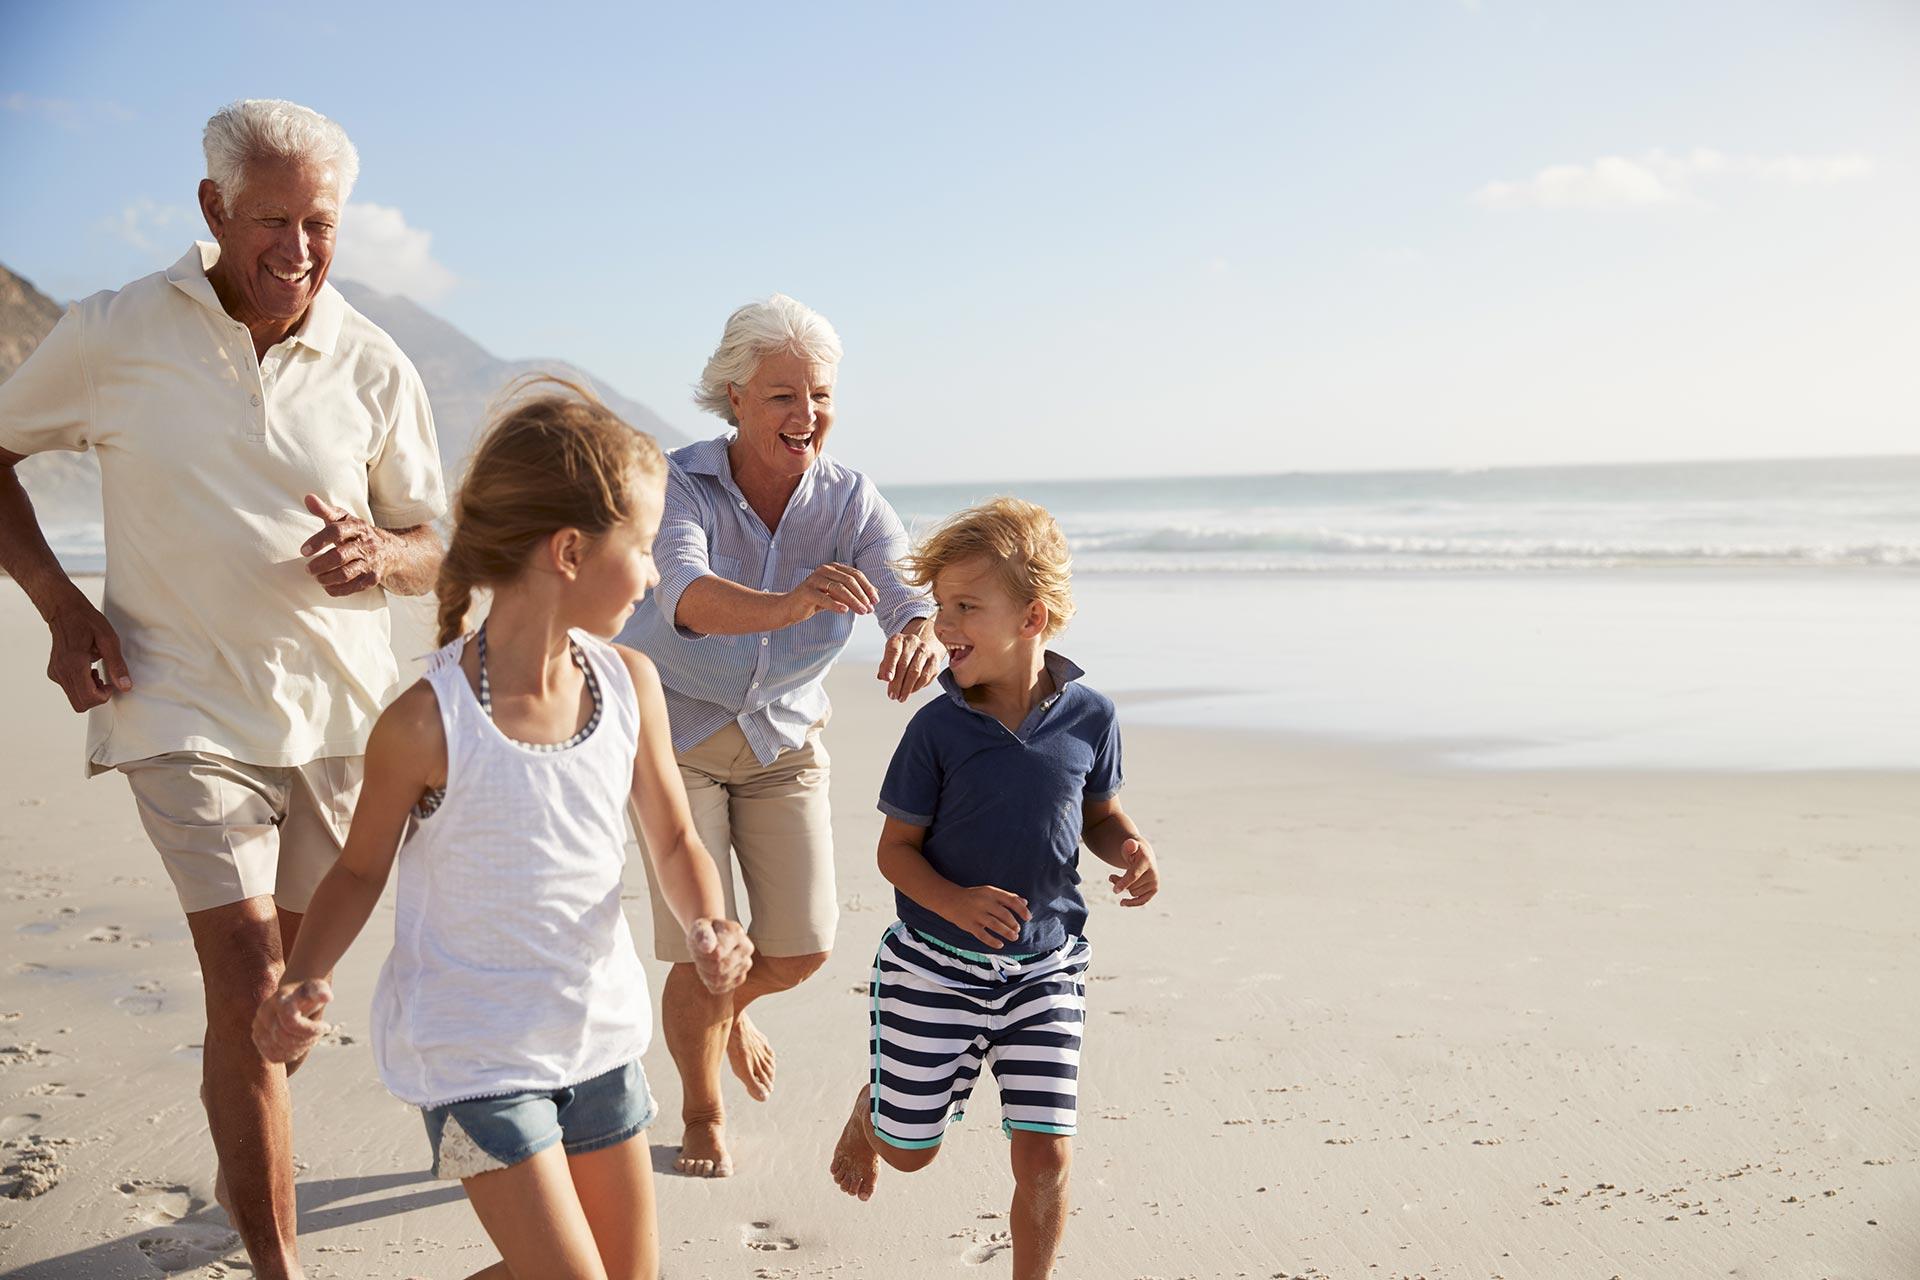 grandparents and kids running on beach